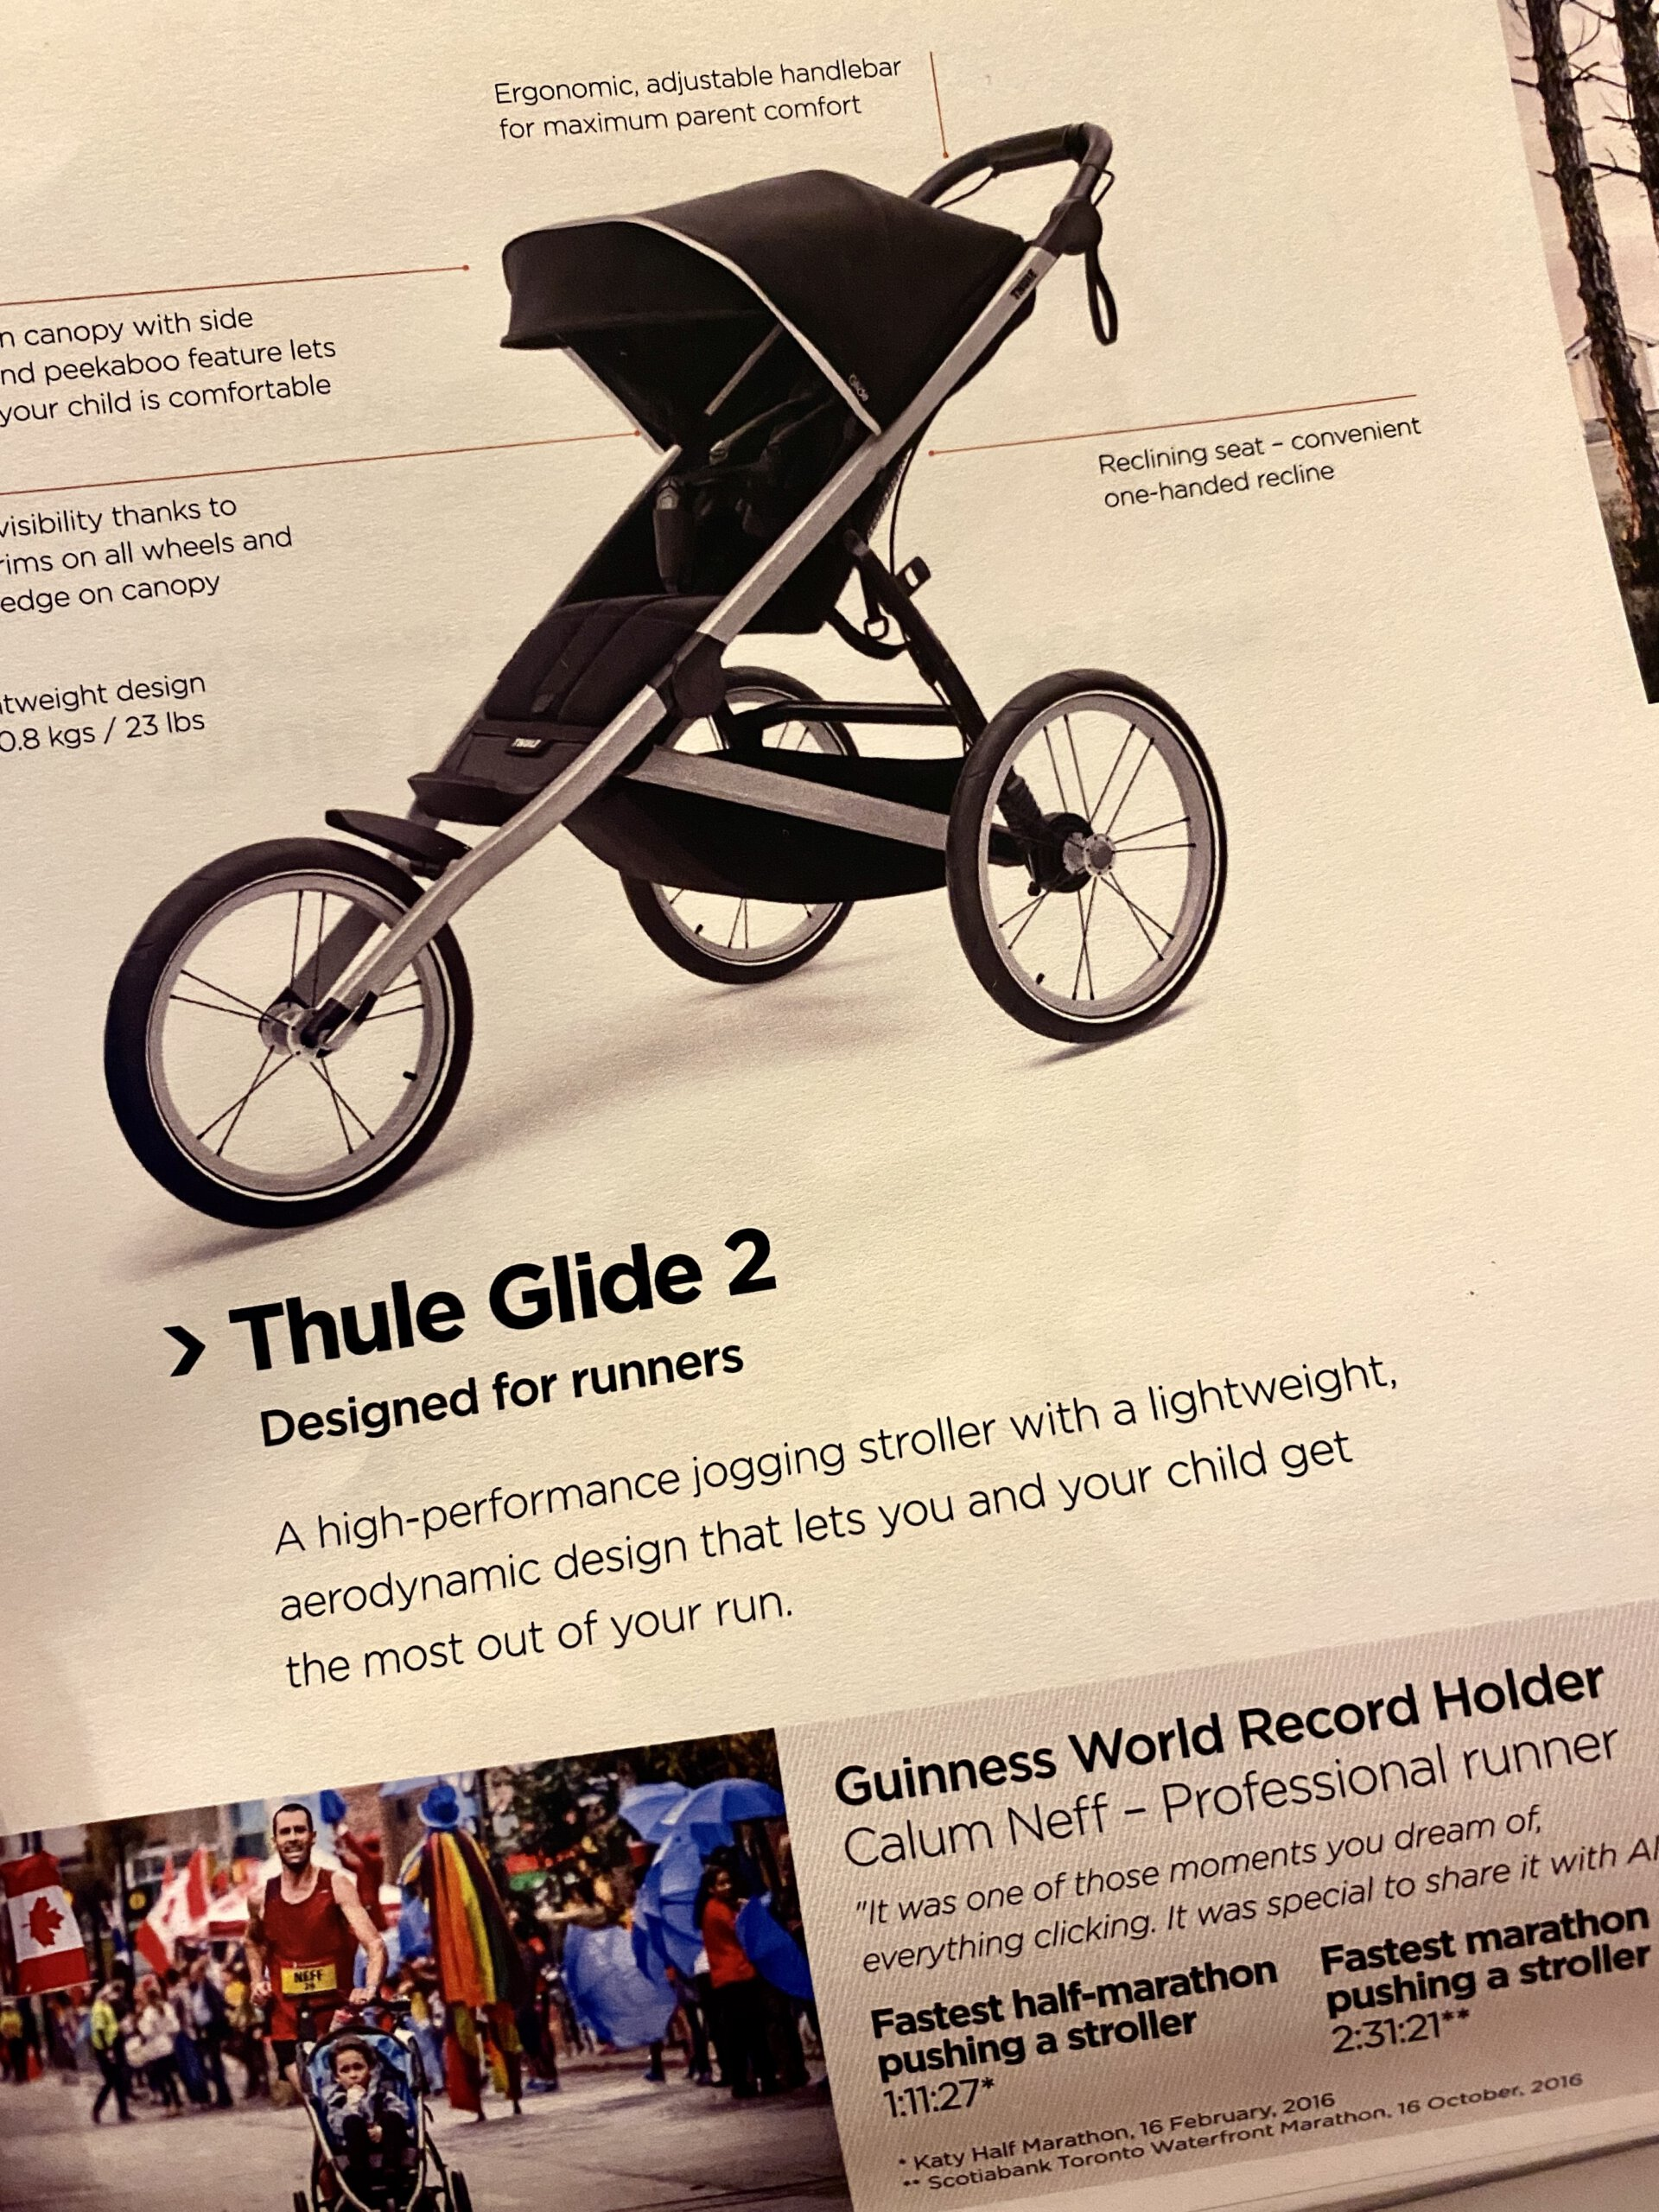 hardloop kinderwagen, babyjogger, kinderwagen, hardlopen, hardlopen met je baby, joggen met je kindje, thule uraan glide 2, thule glide 2